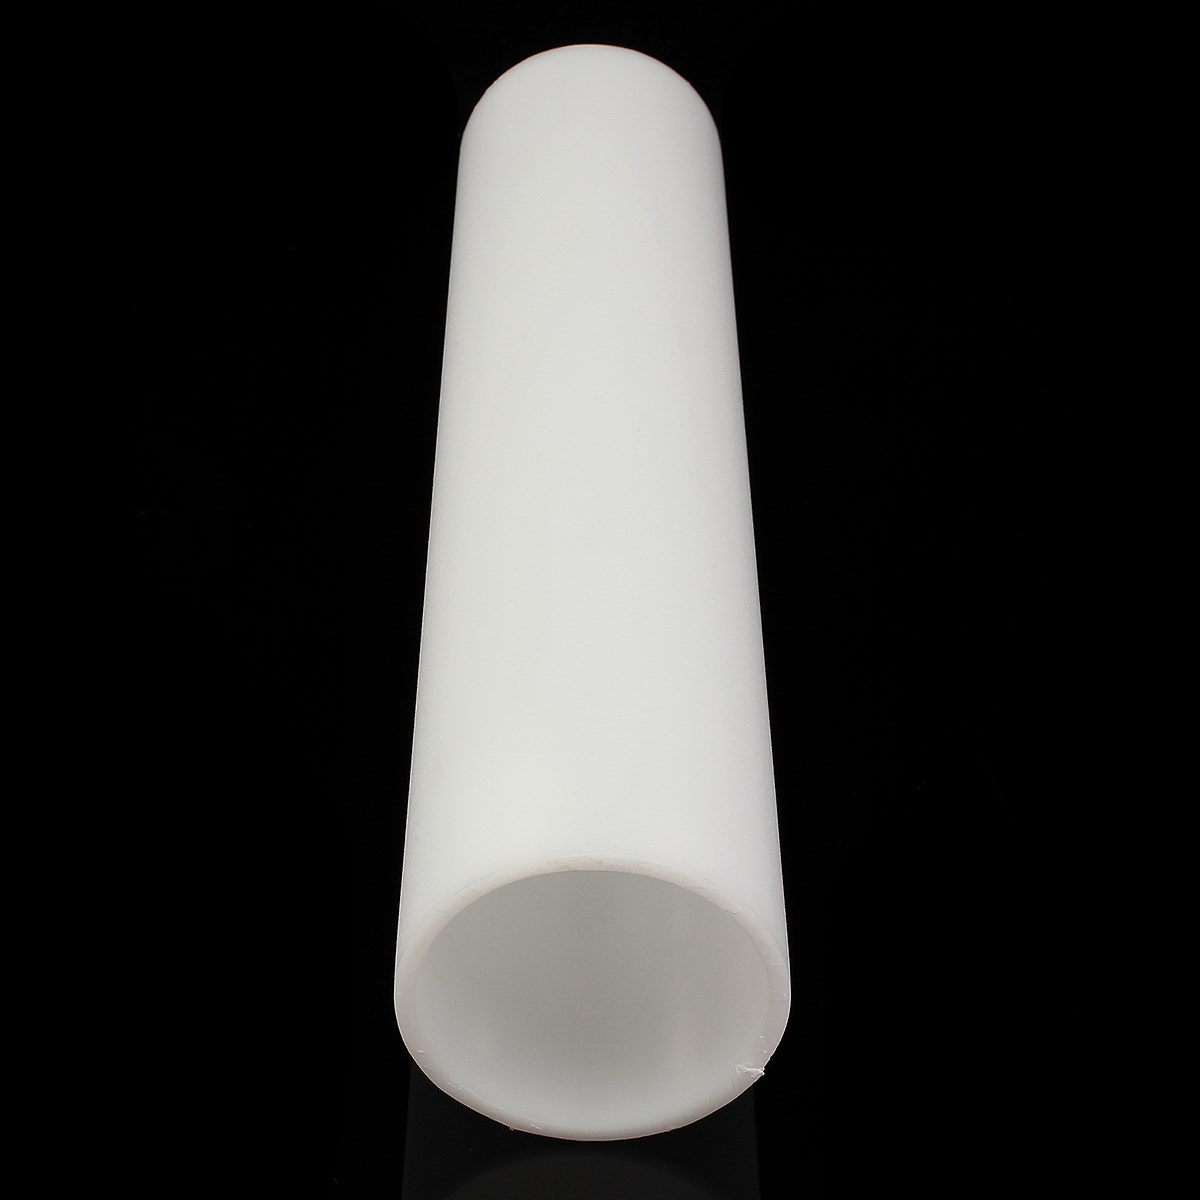 Hotte Aspirante Tube intérieur hotte aspirante tube - alamode-furniture